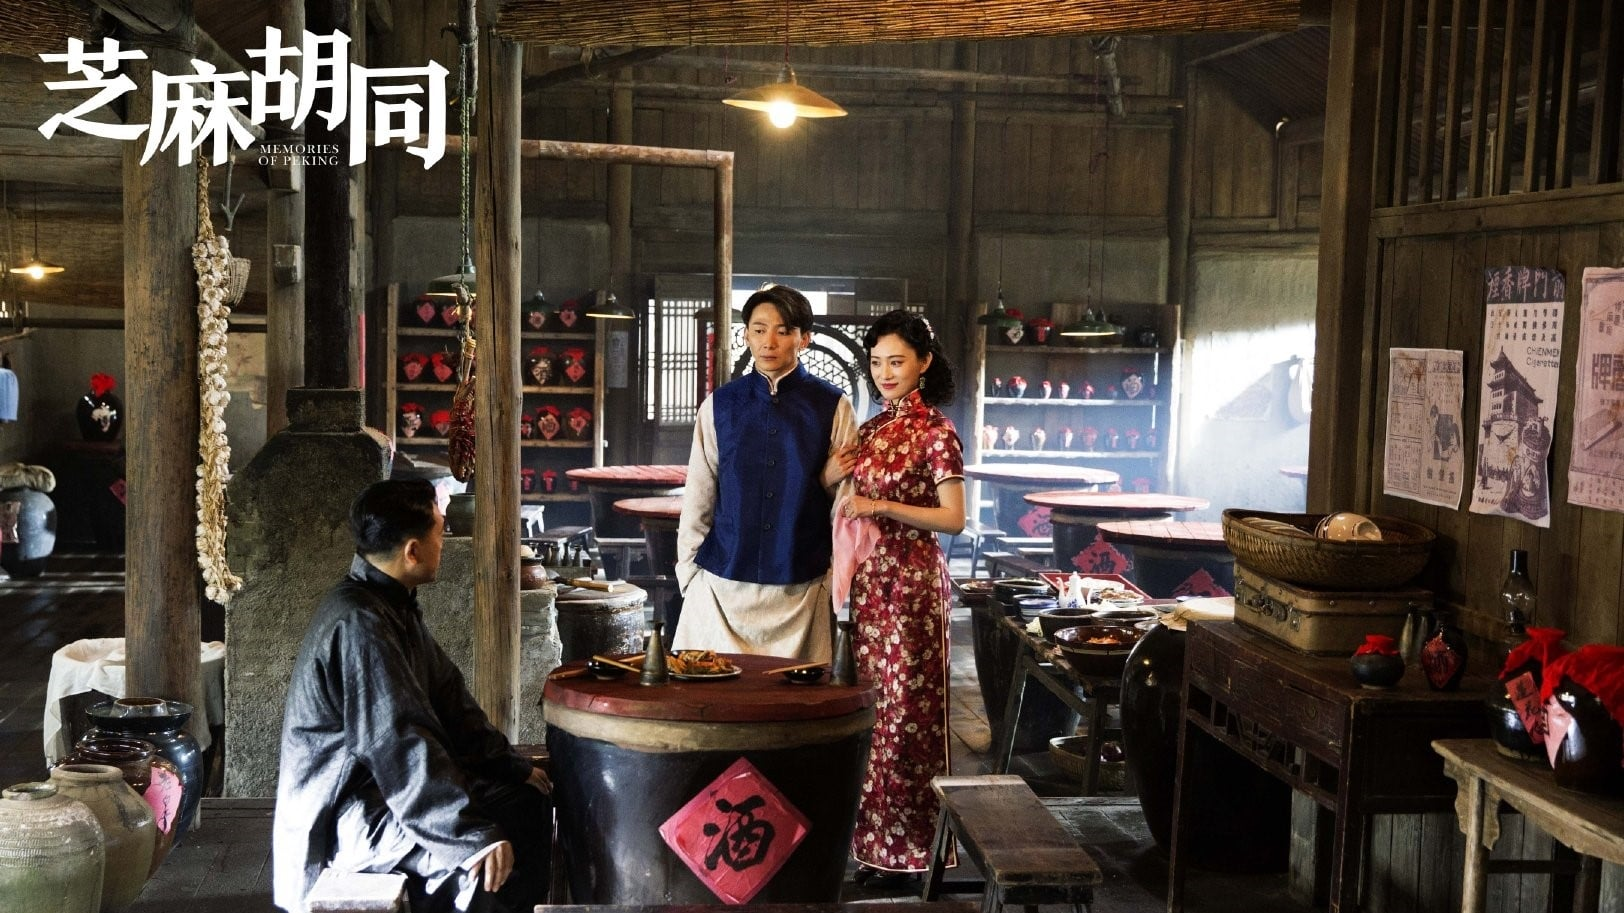 Memories of Peking